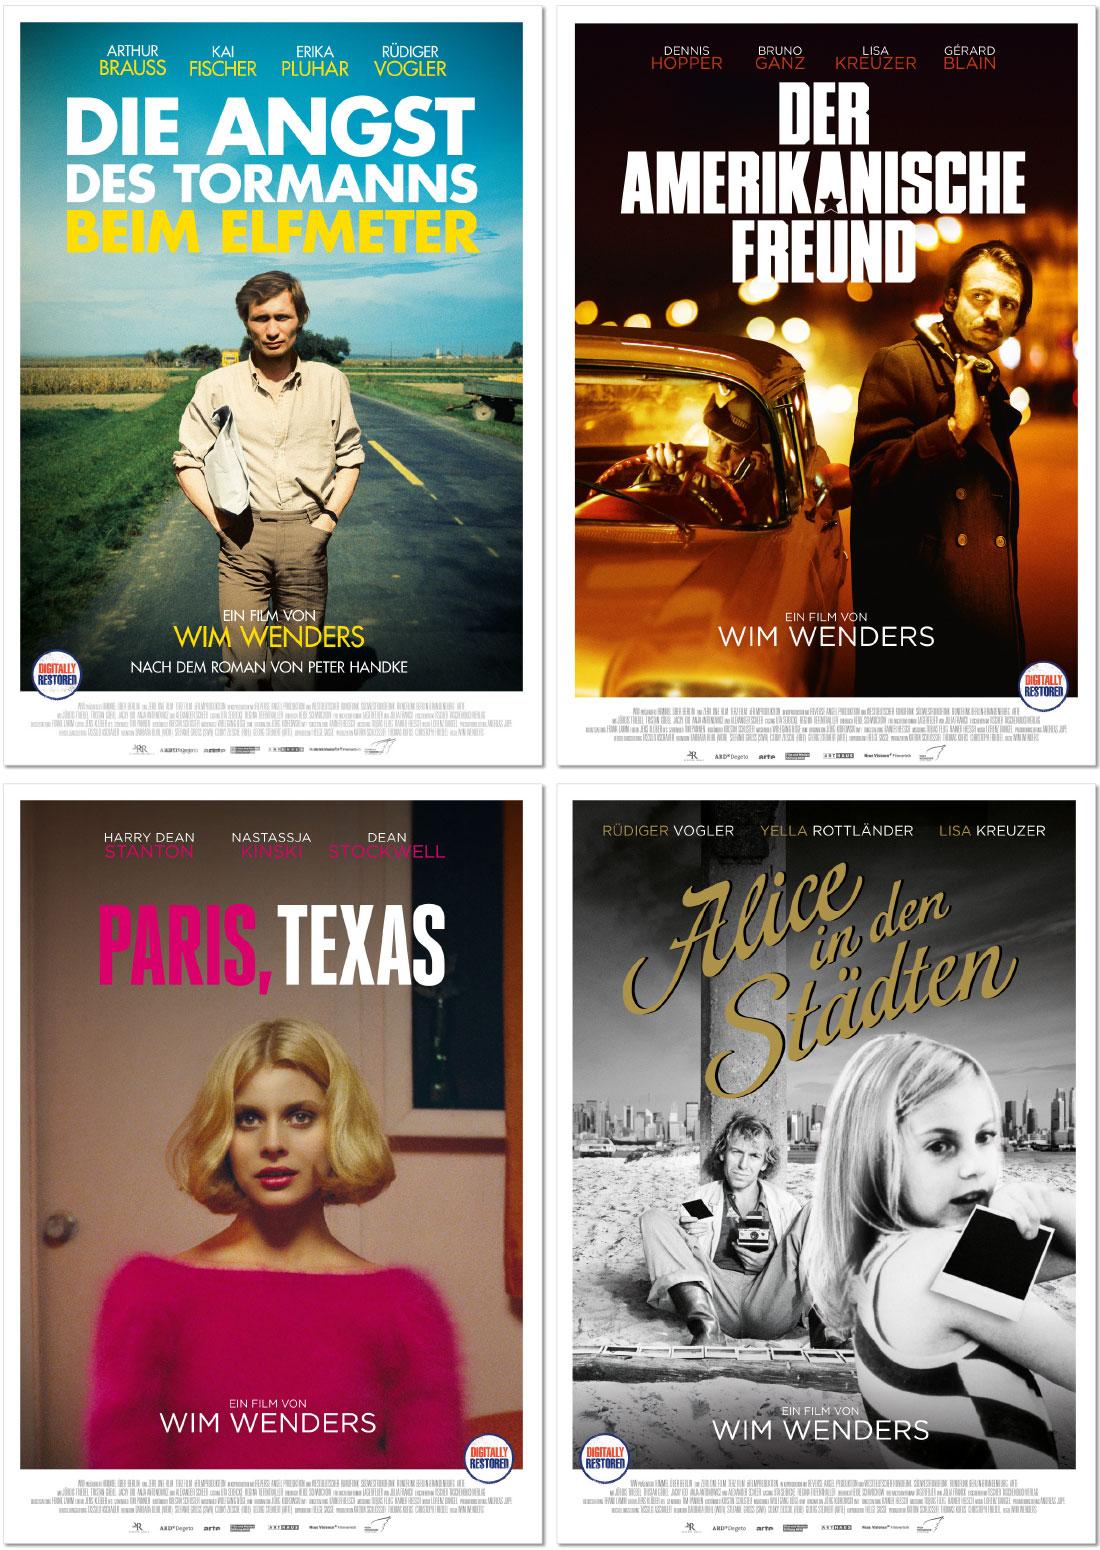 Affaire Populaire Grafik Design Wim Wenders DVD Arthaus Plakate